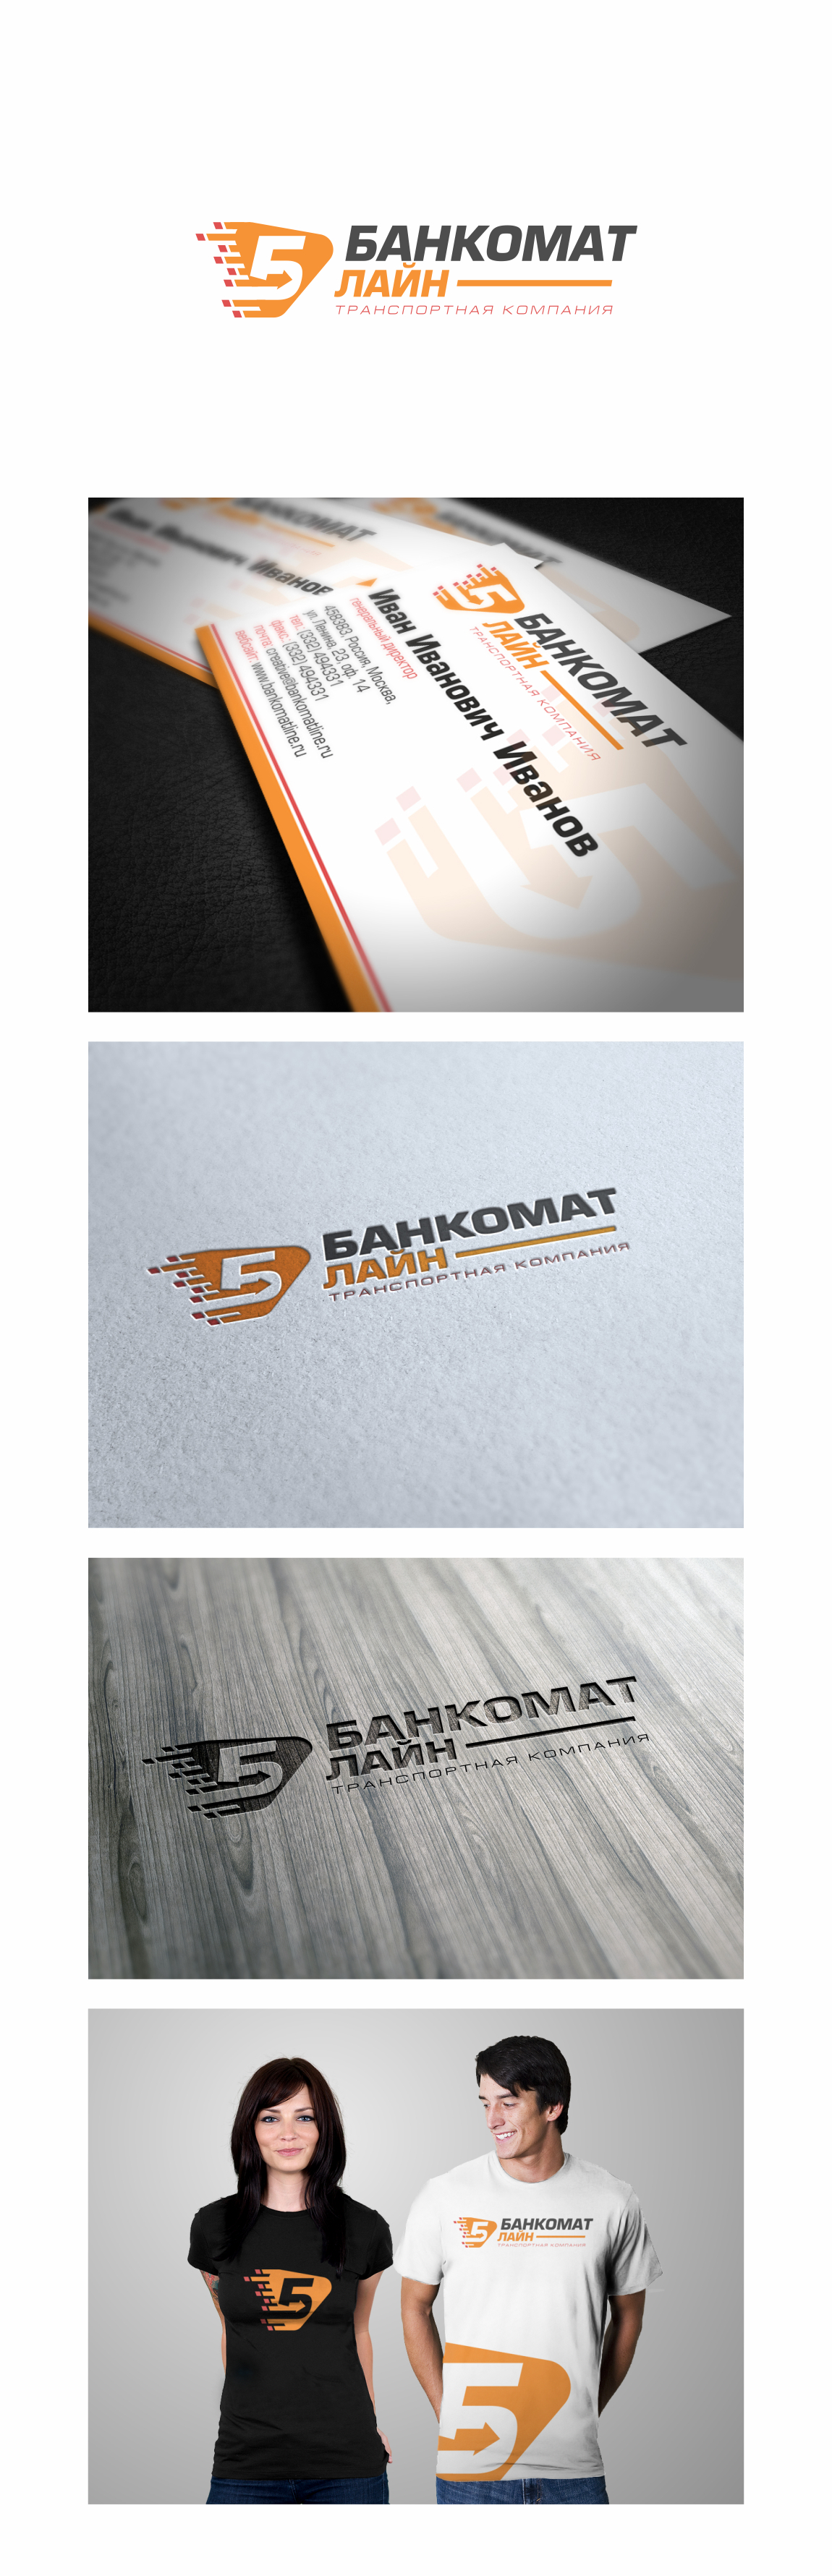 Разработка логотипа и слогана для транспортной компании фото f_592588f4f1eb45d9.jpg